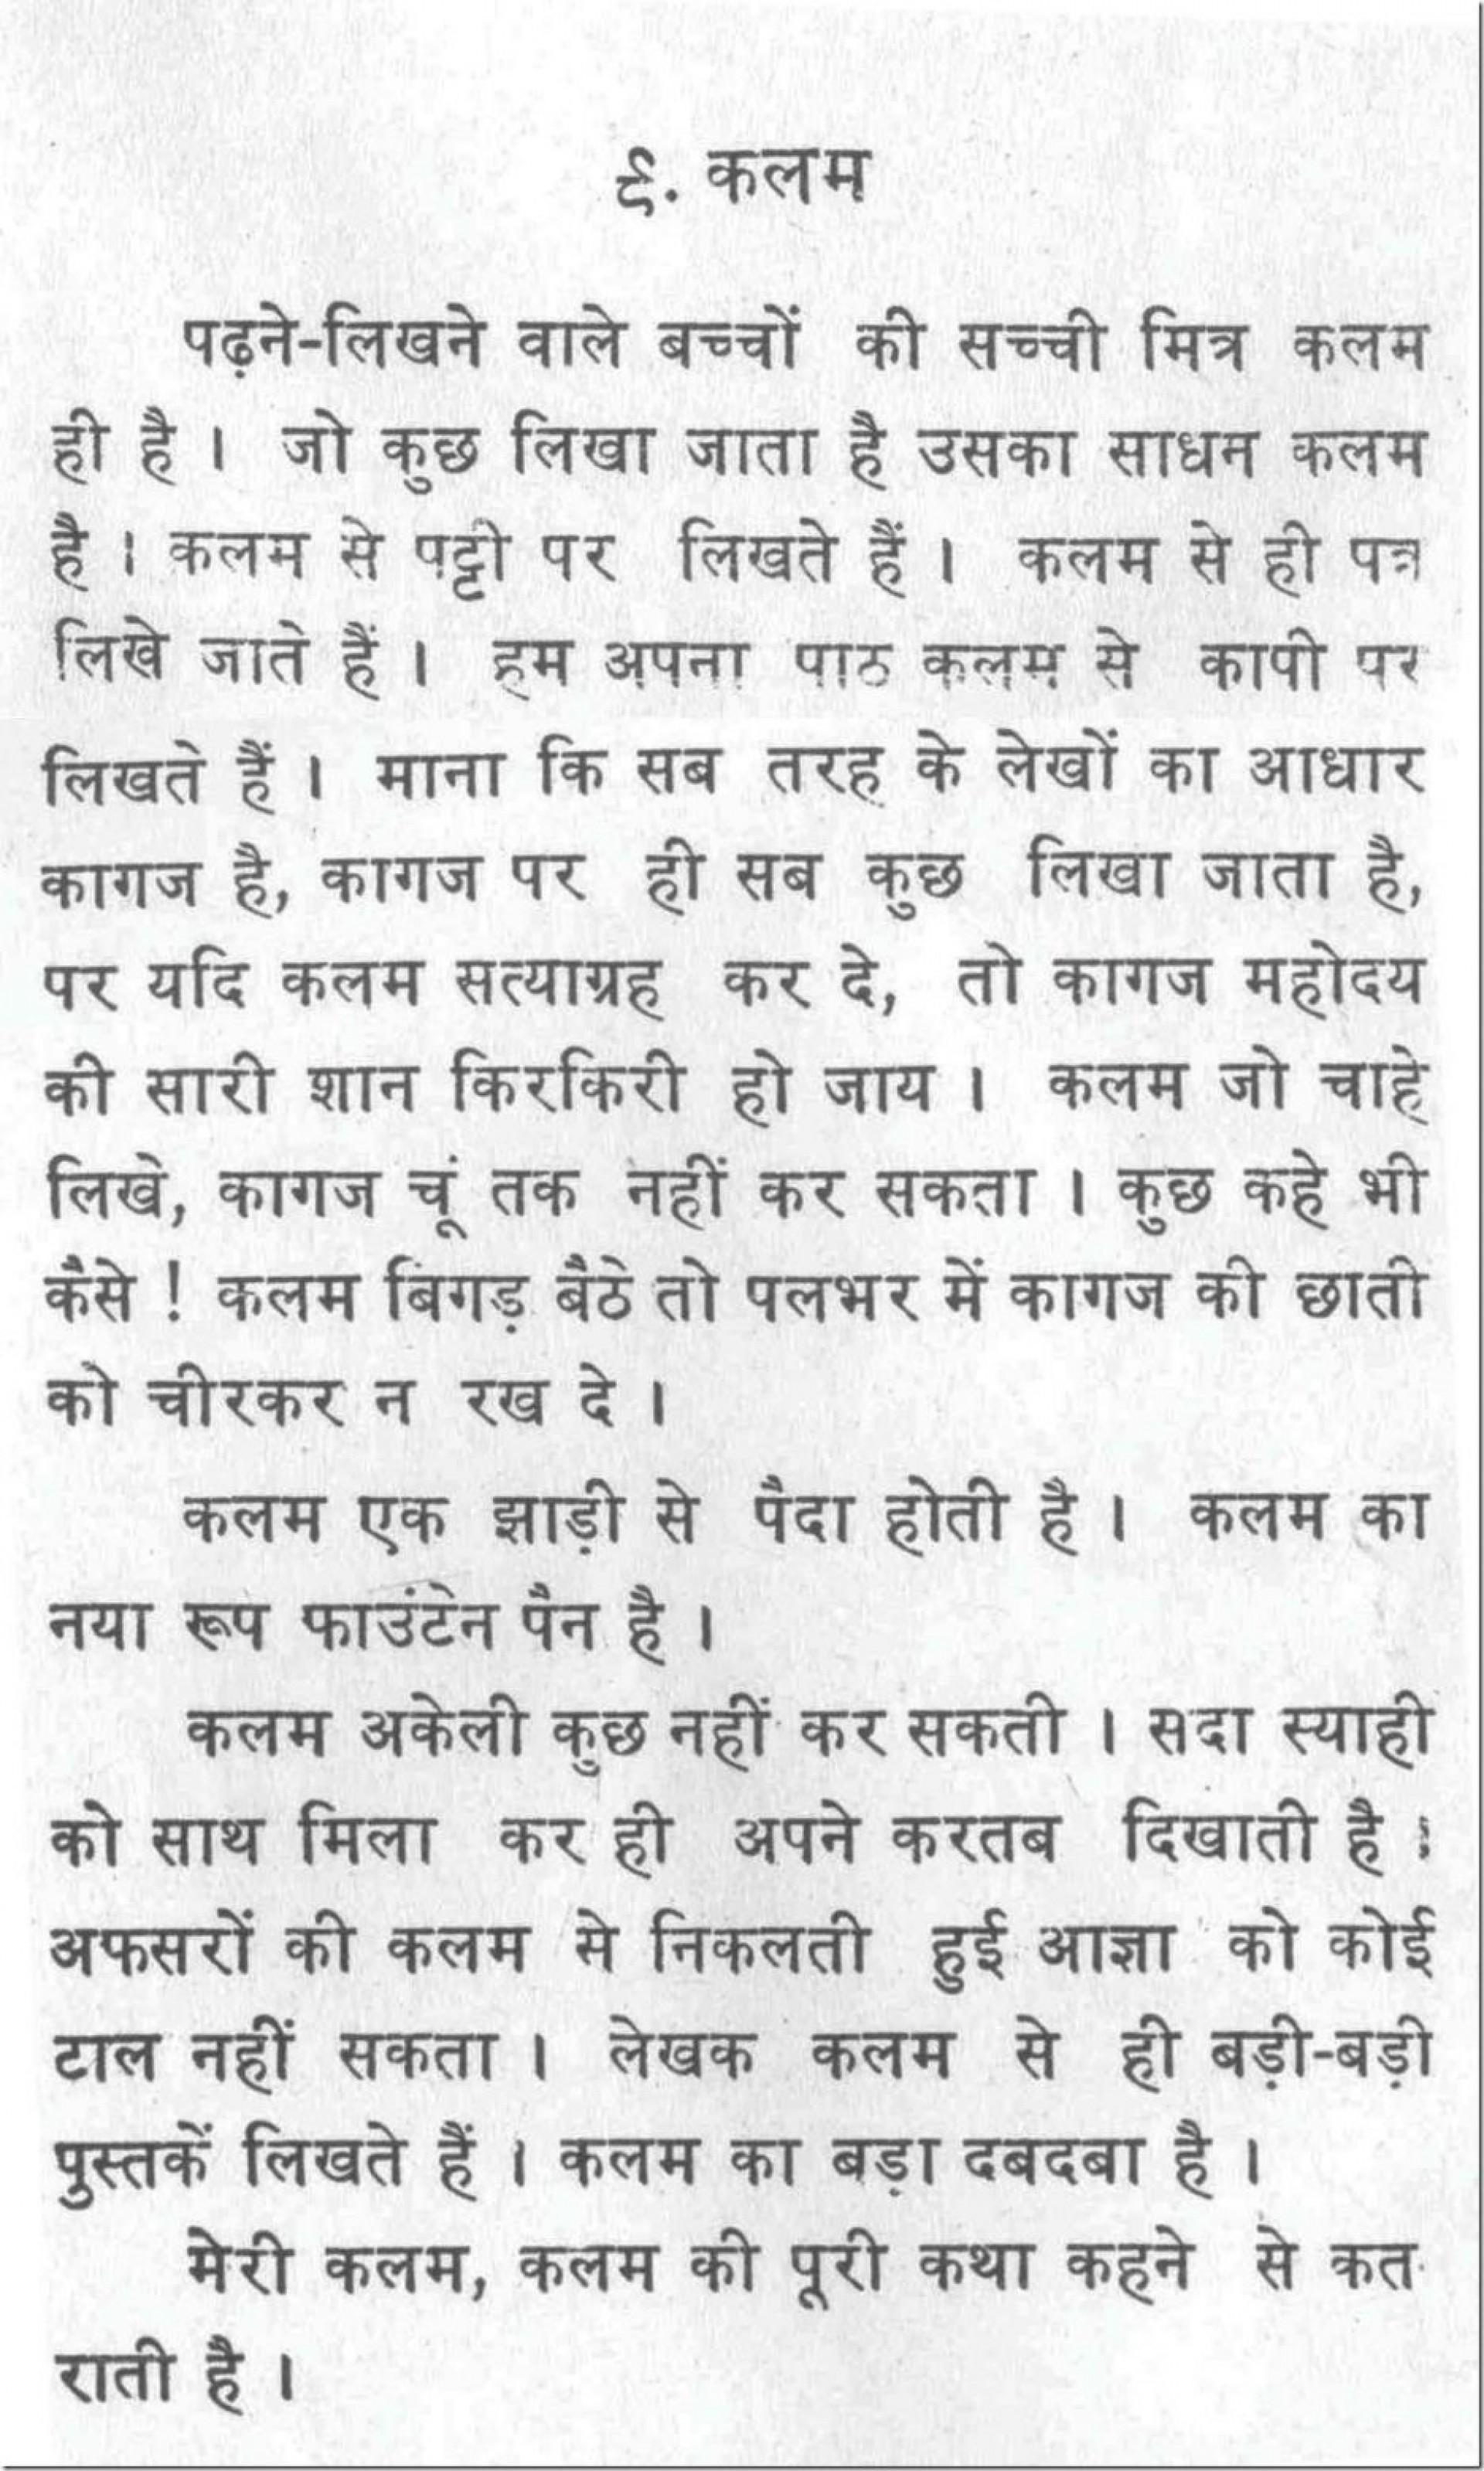 013 Essay On Bhagat Singh In Marathi Example Hindi Thumb Short Telugu English Language Sanskrit Words Urdu Punjabi Kannada Unique 100 1920